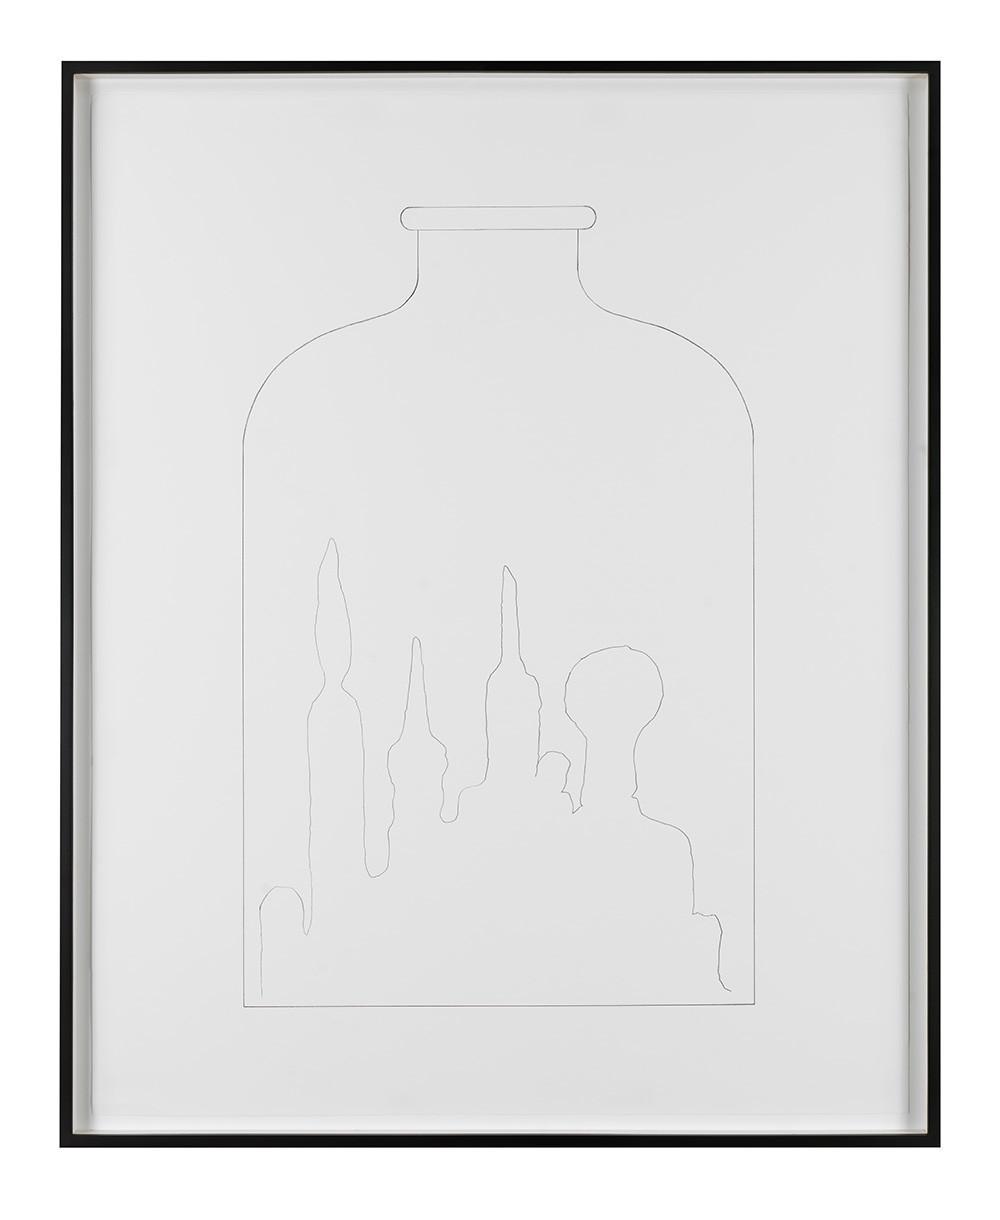 "Mike Kelley, ""No Title (Kandor bottle drawing),"" 2005, pencil."